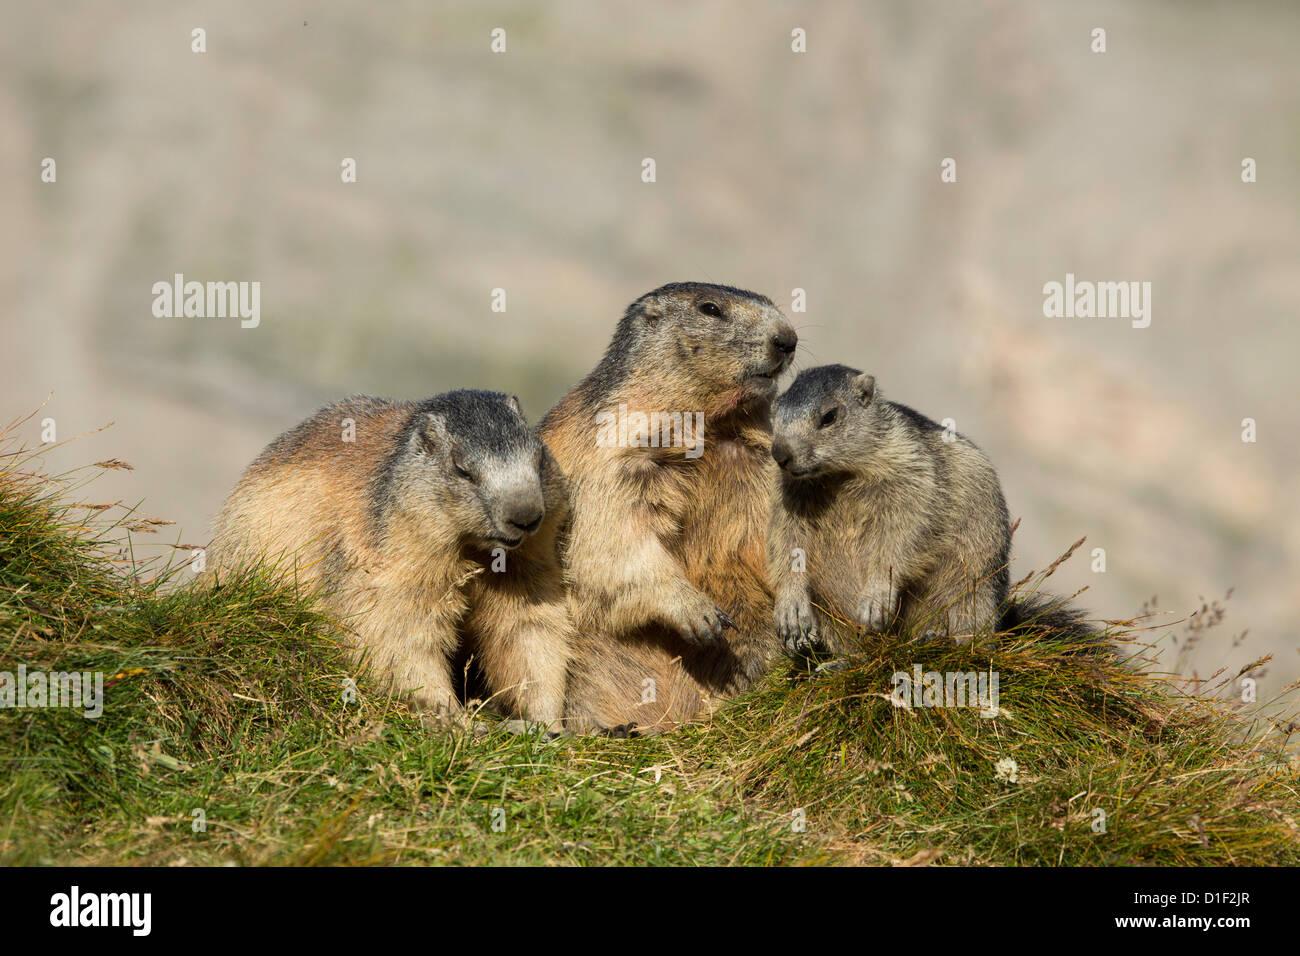 Three Alpine marmots (Marmota marmota) - Stock Image